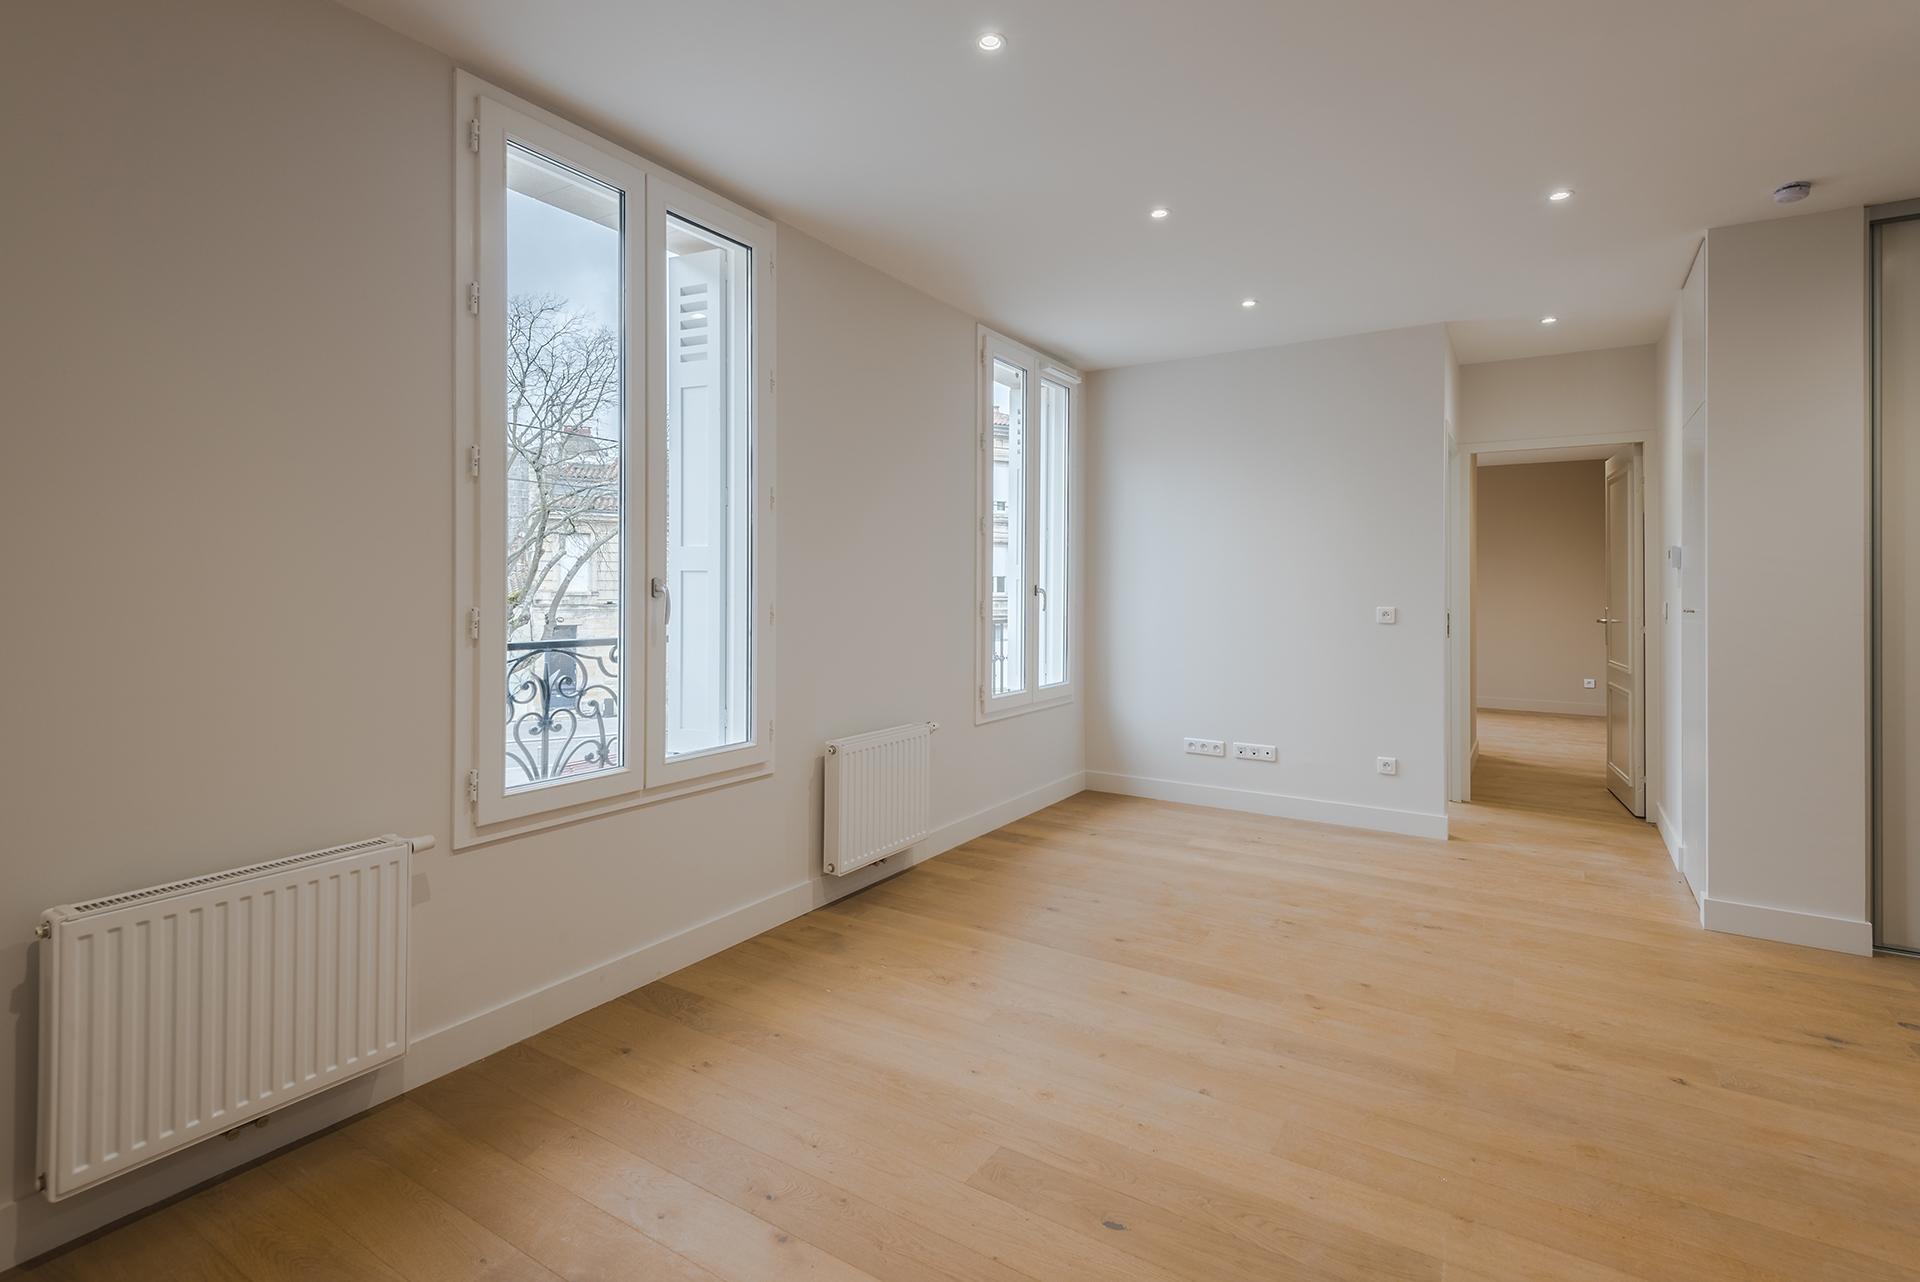 logement collectif bordeaux. Black Bedroom Furniture Sets. Home Design Ideas